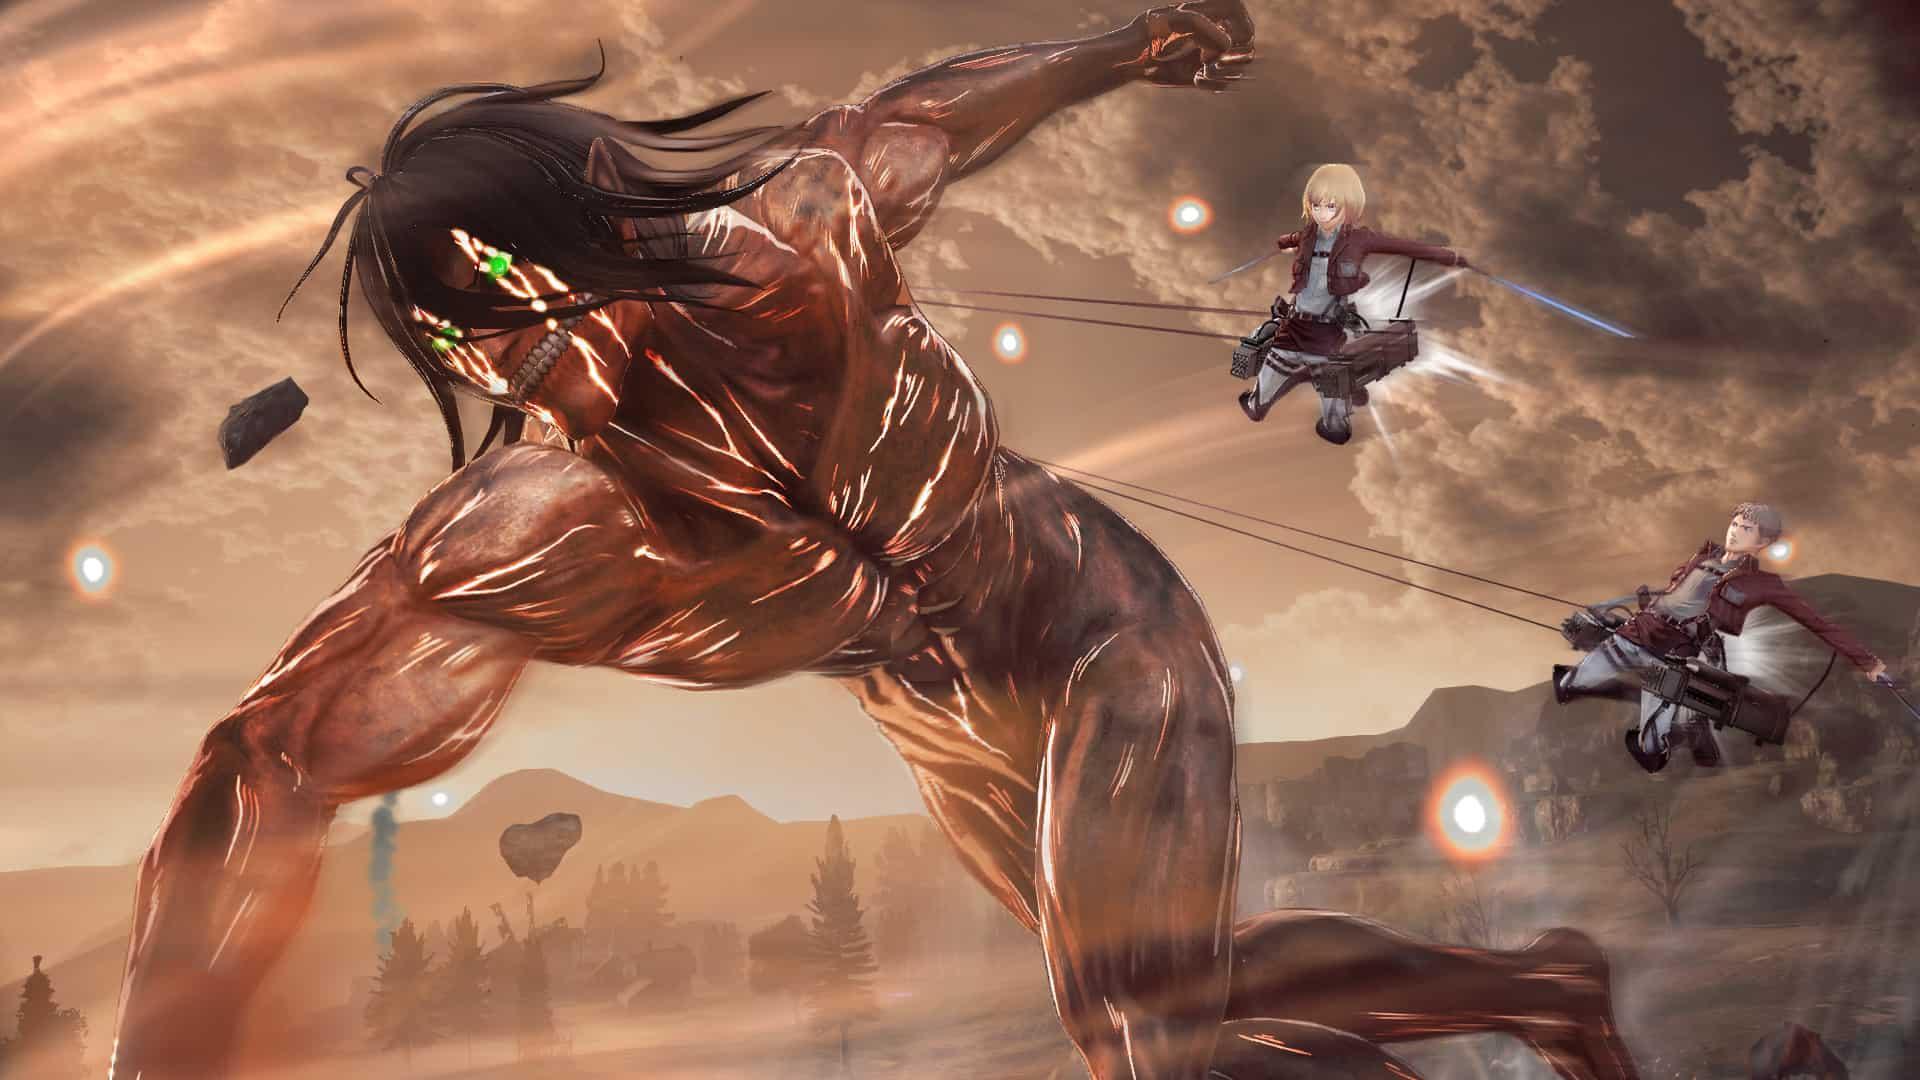 AttackonTitan2 Screenshot23 - Nuovi trailer gameplay per Attack on Titan 2